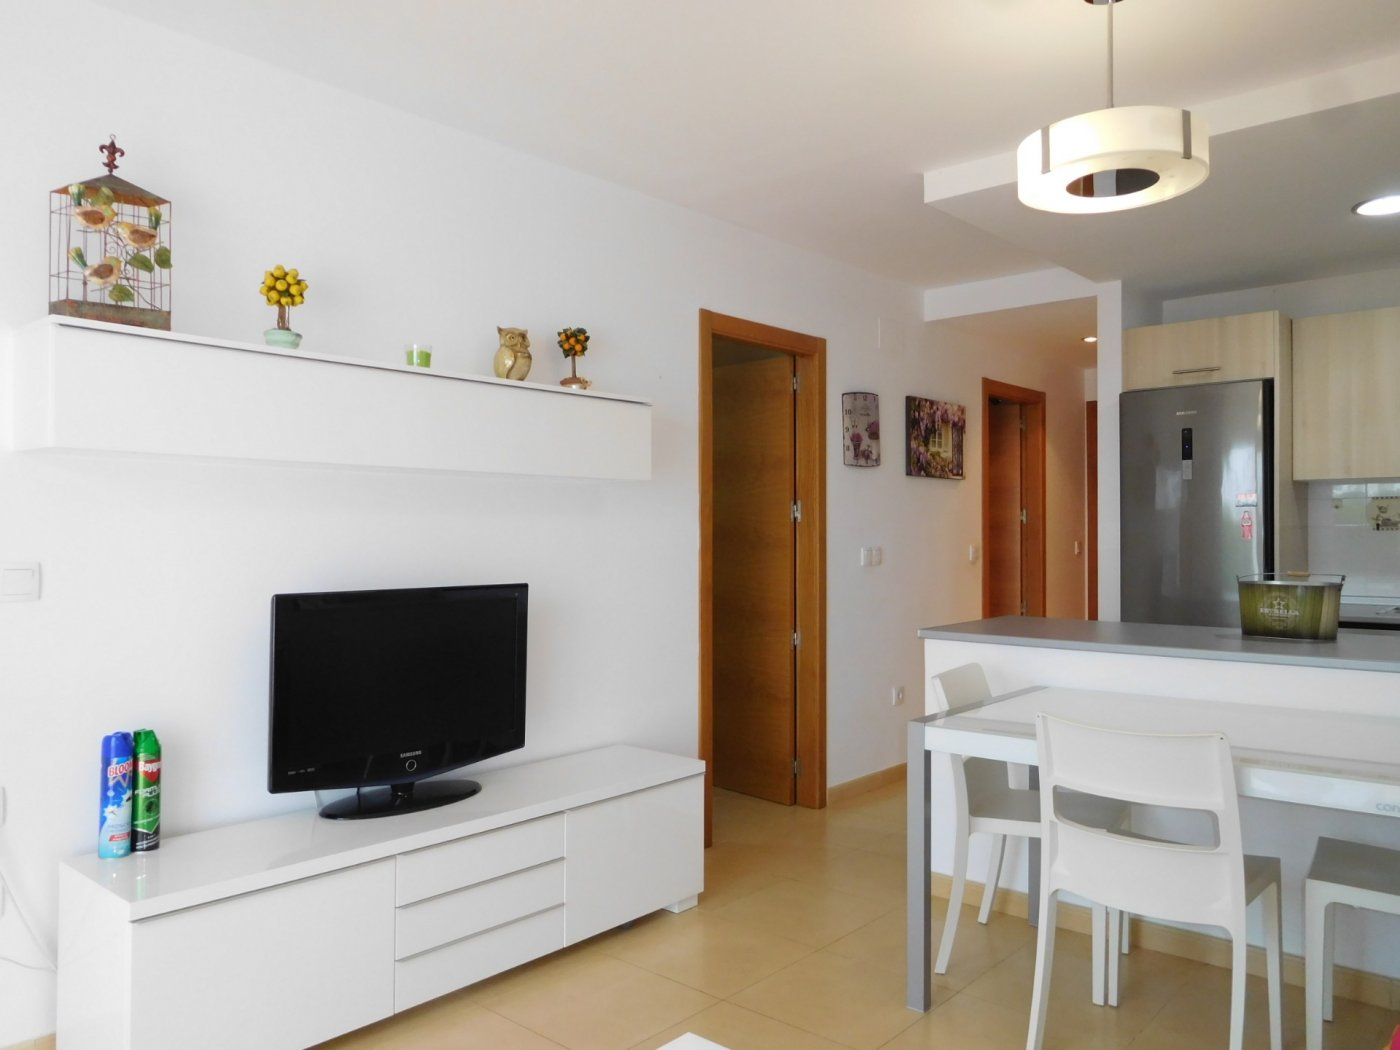 Gallery Image 10 of Apartment For rent in Condado De Alhama, Alhama De Murcia